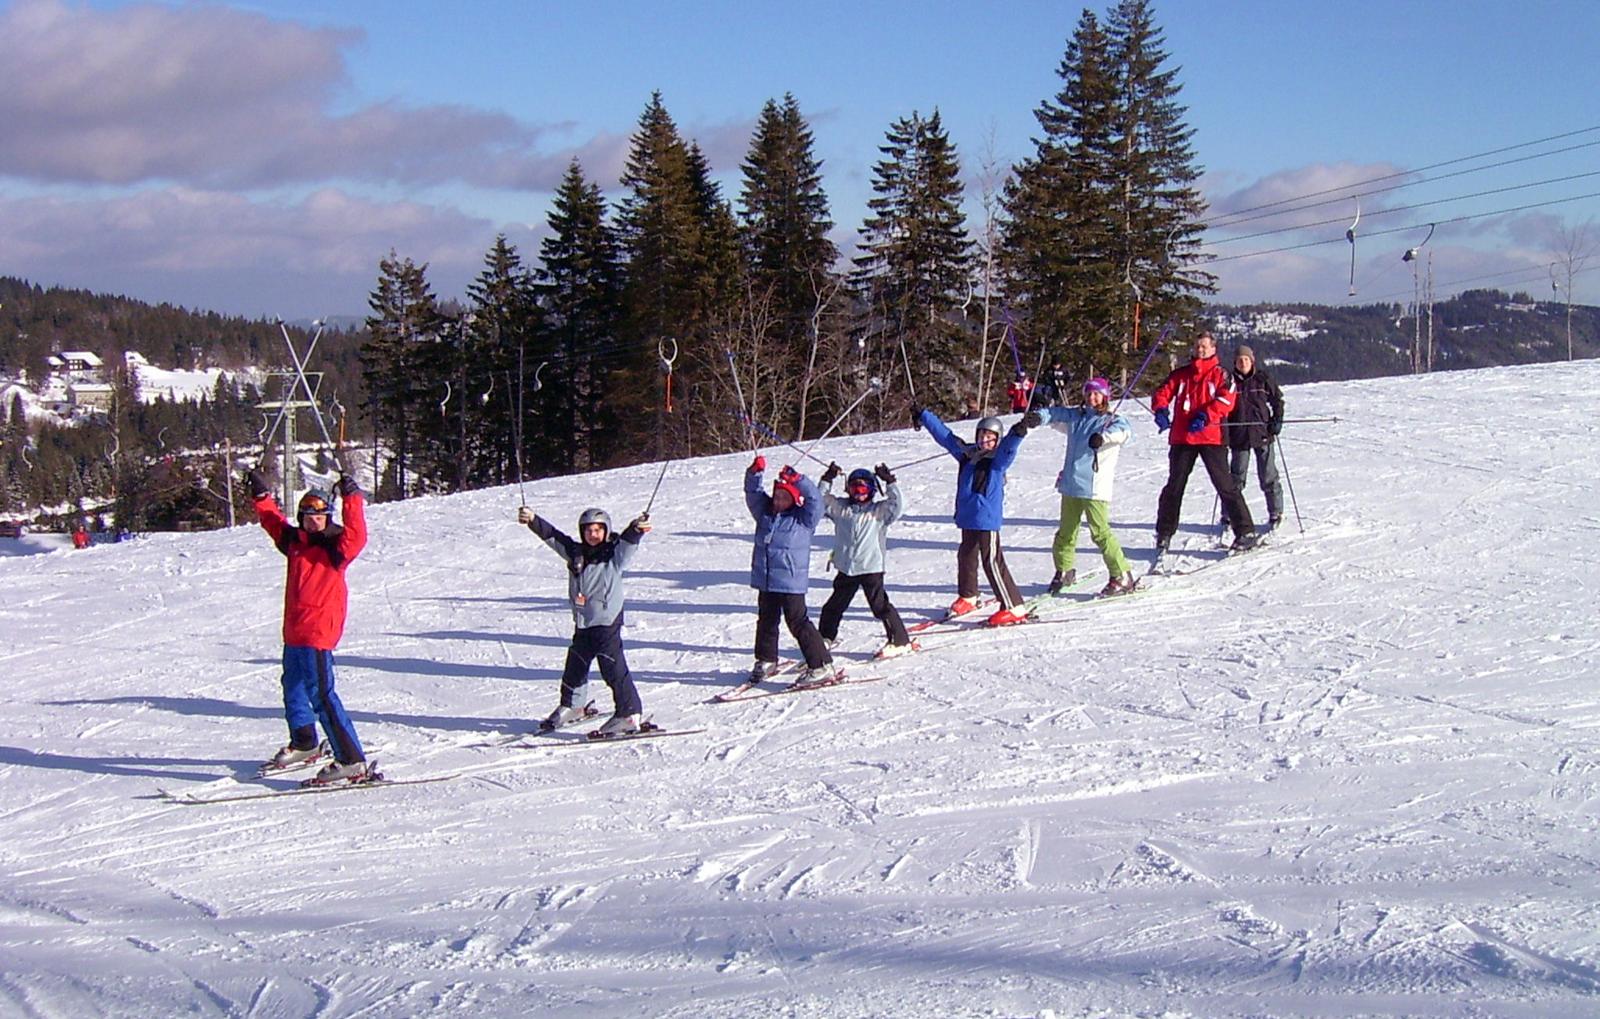 1-taegiger-skikurs-am-feldberg-bg1